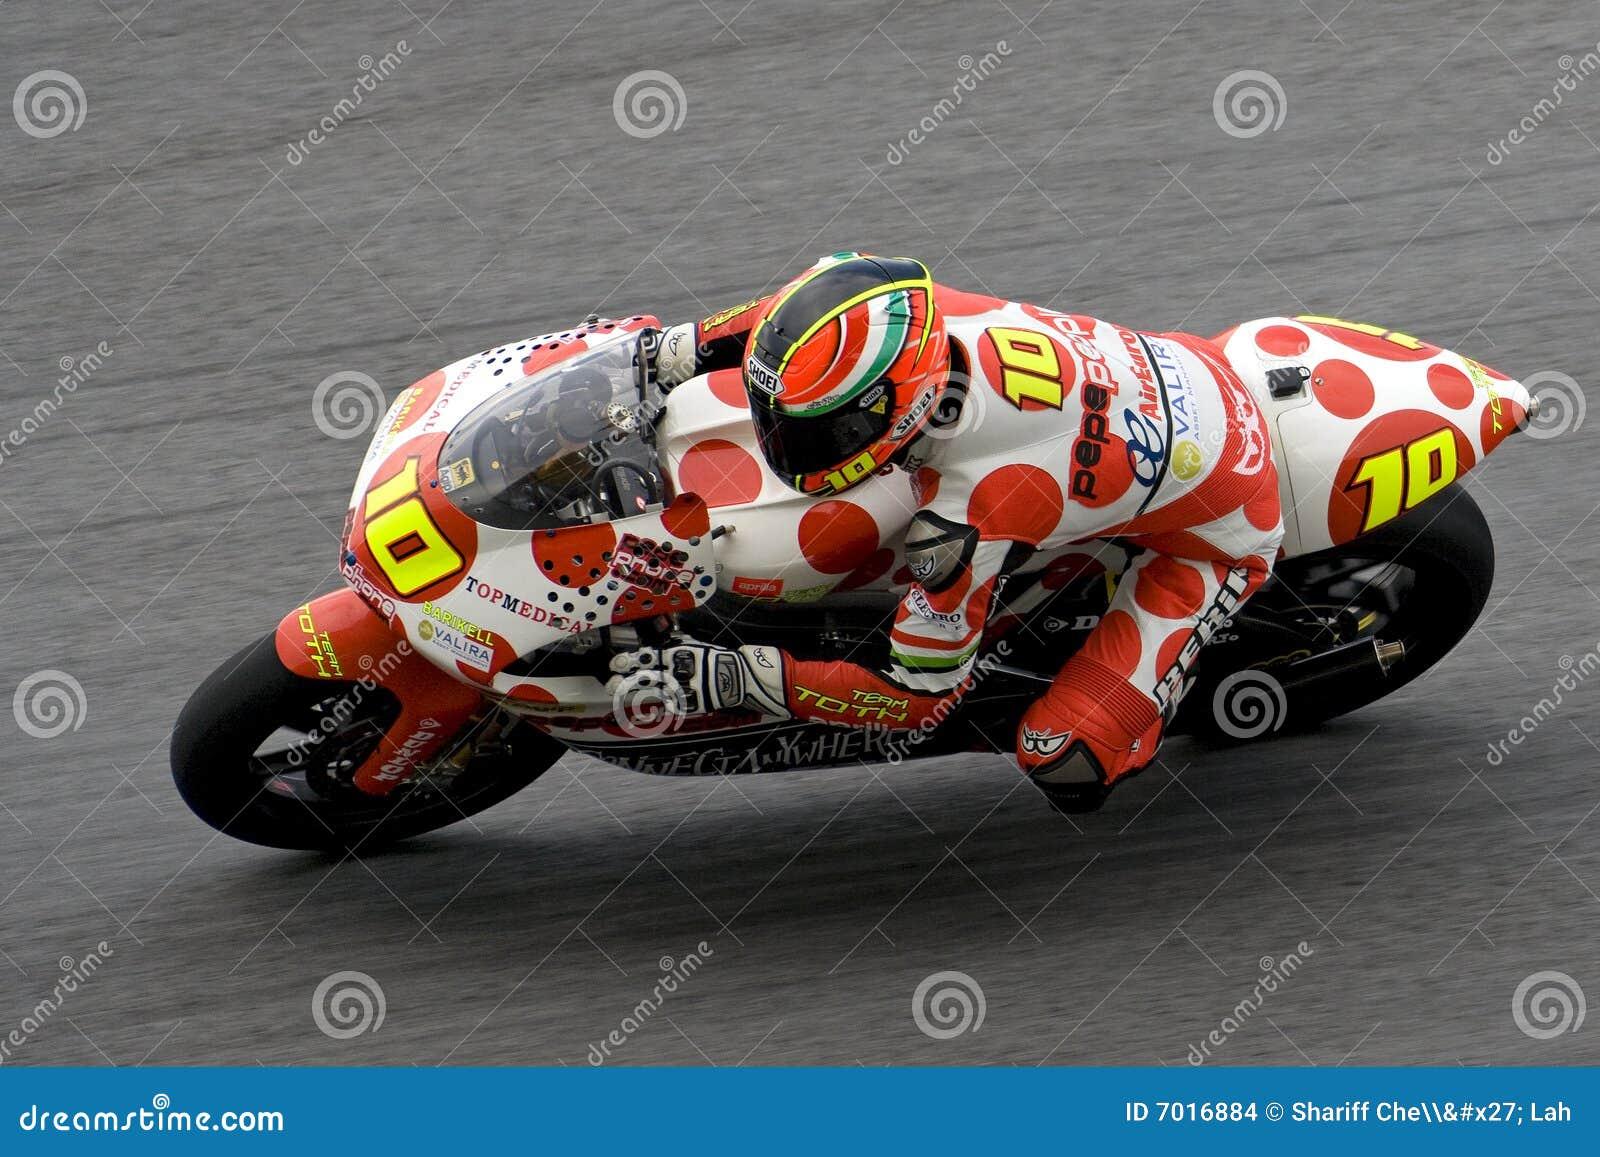 motogp-250cc-imre-toth-7016884.jpg